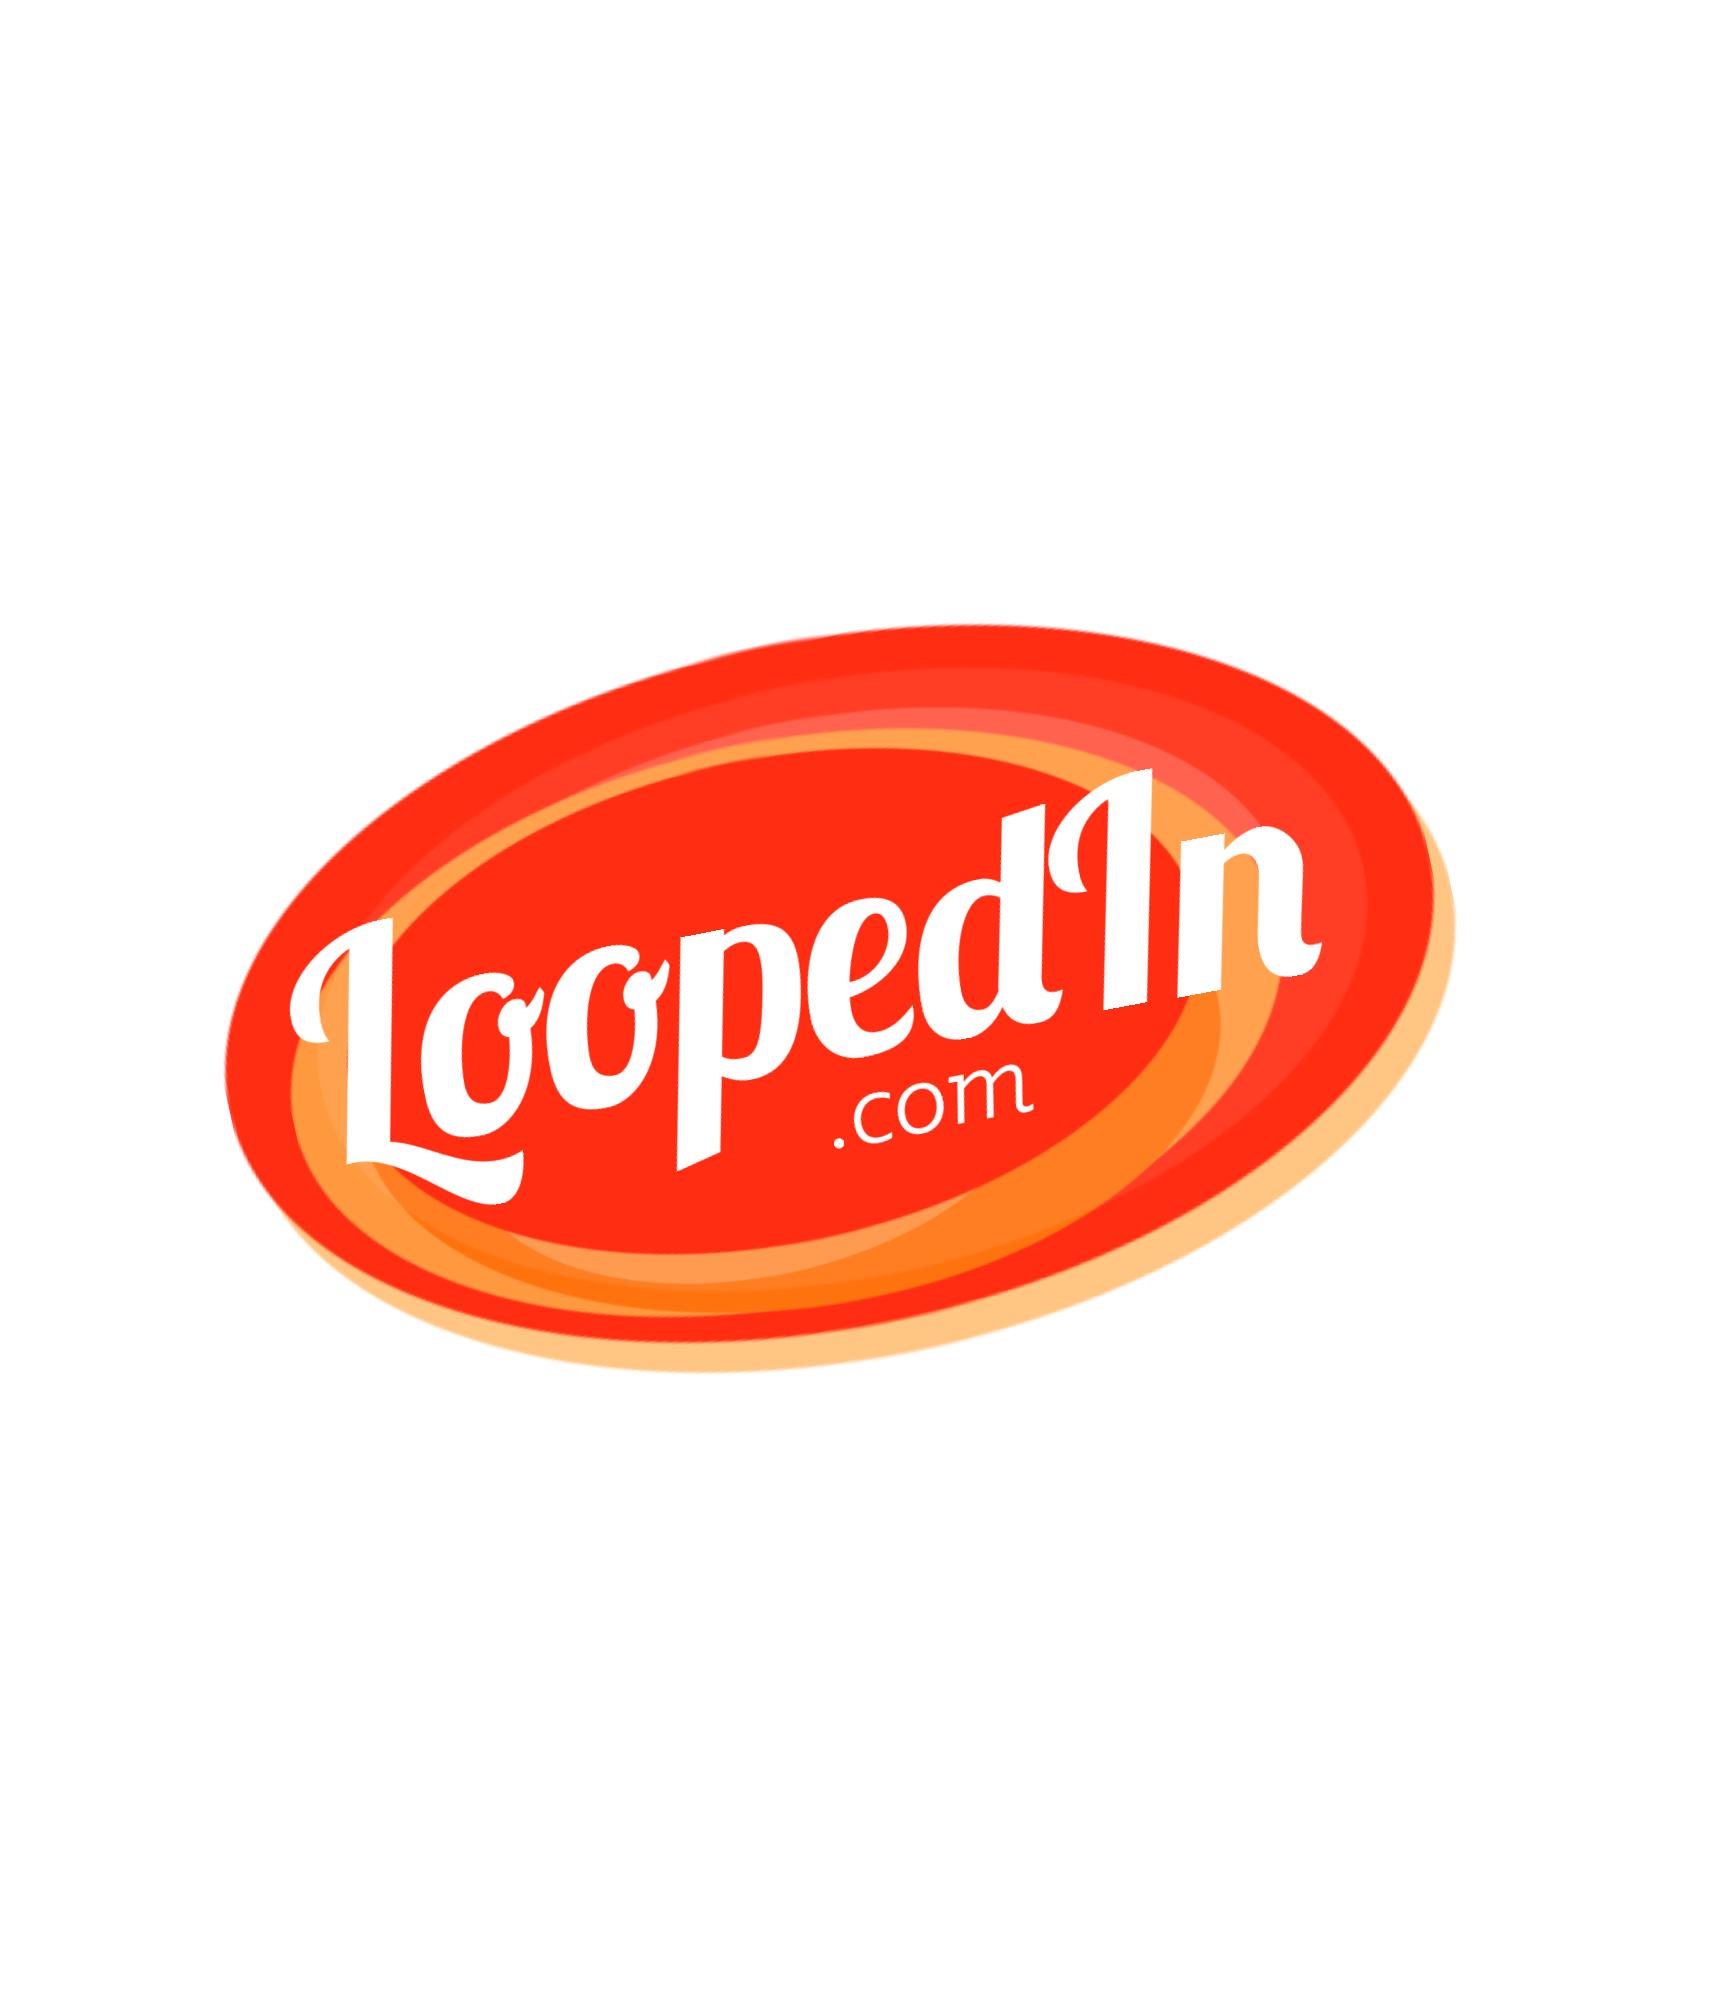 loopedin.com